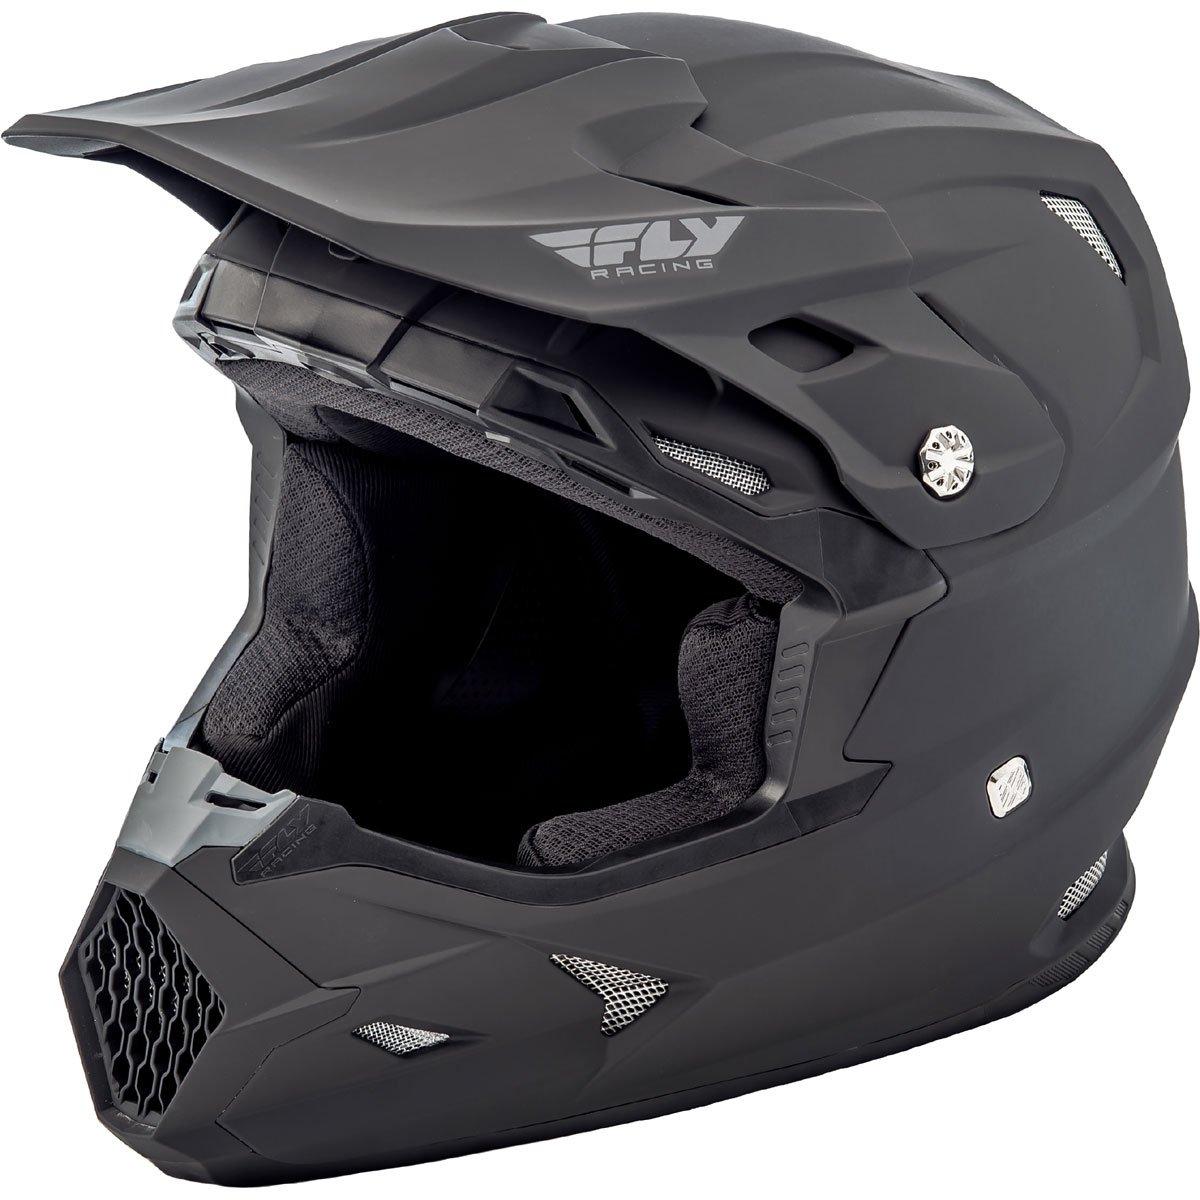 Fly Toxin MIPS Helmet - Solid Matt Image